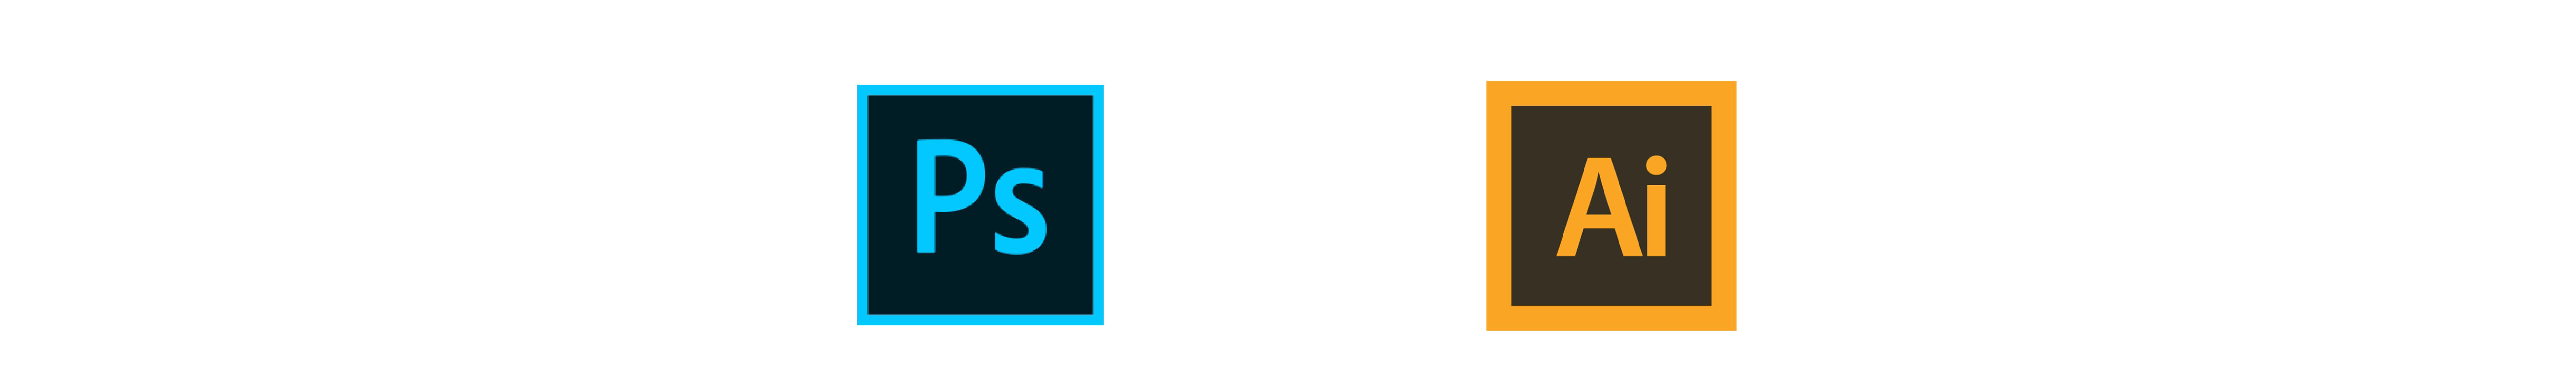 Logo de Photoshop e Illustrator